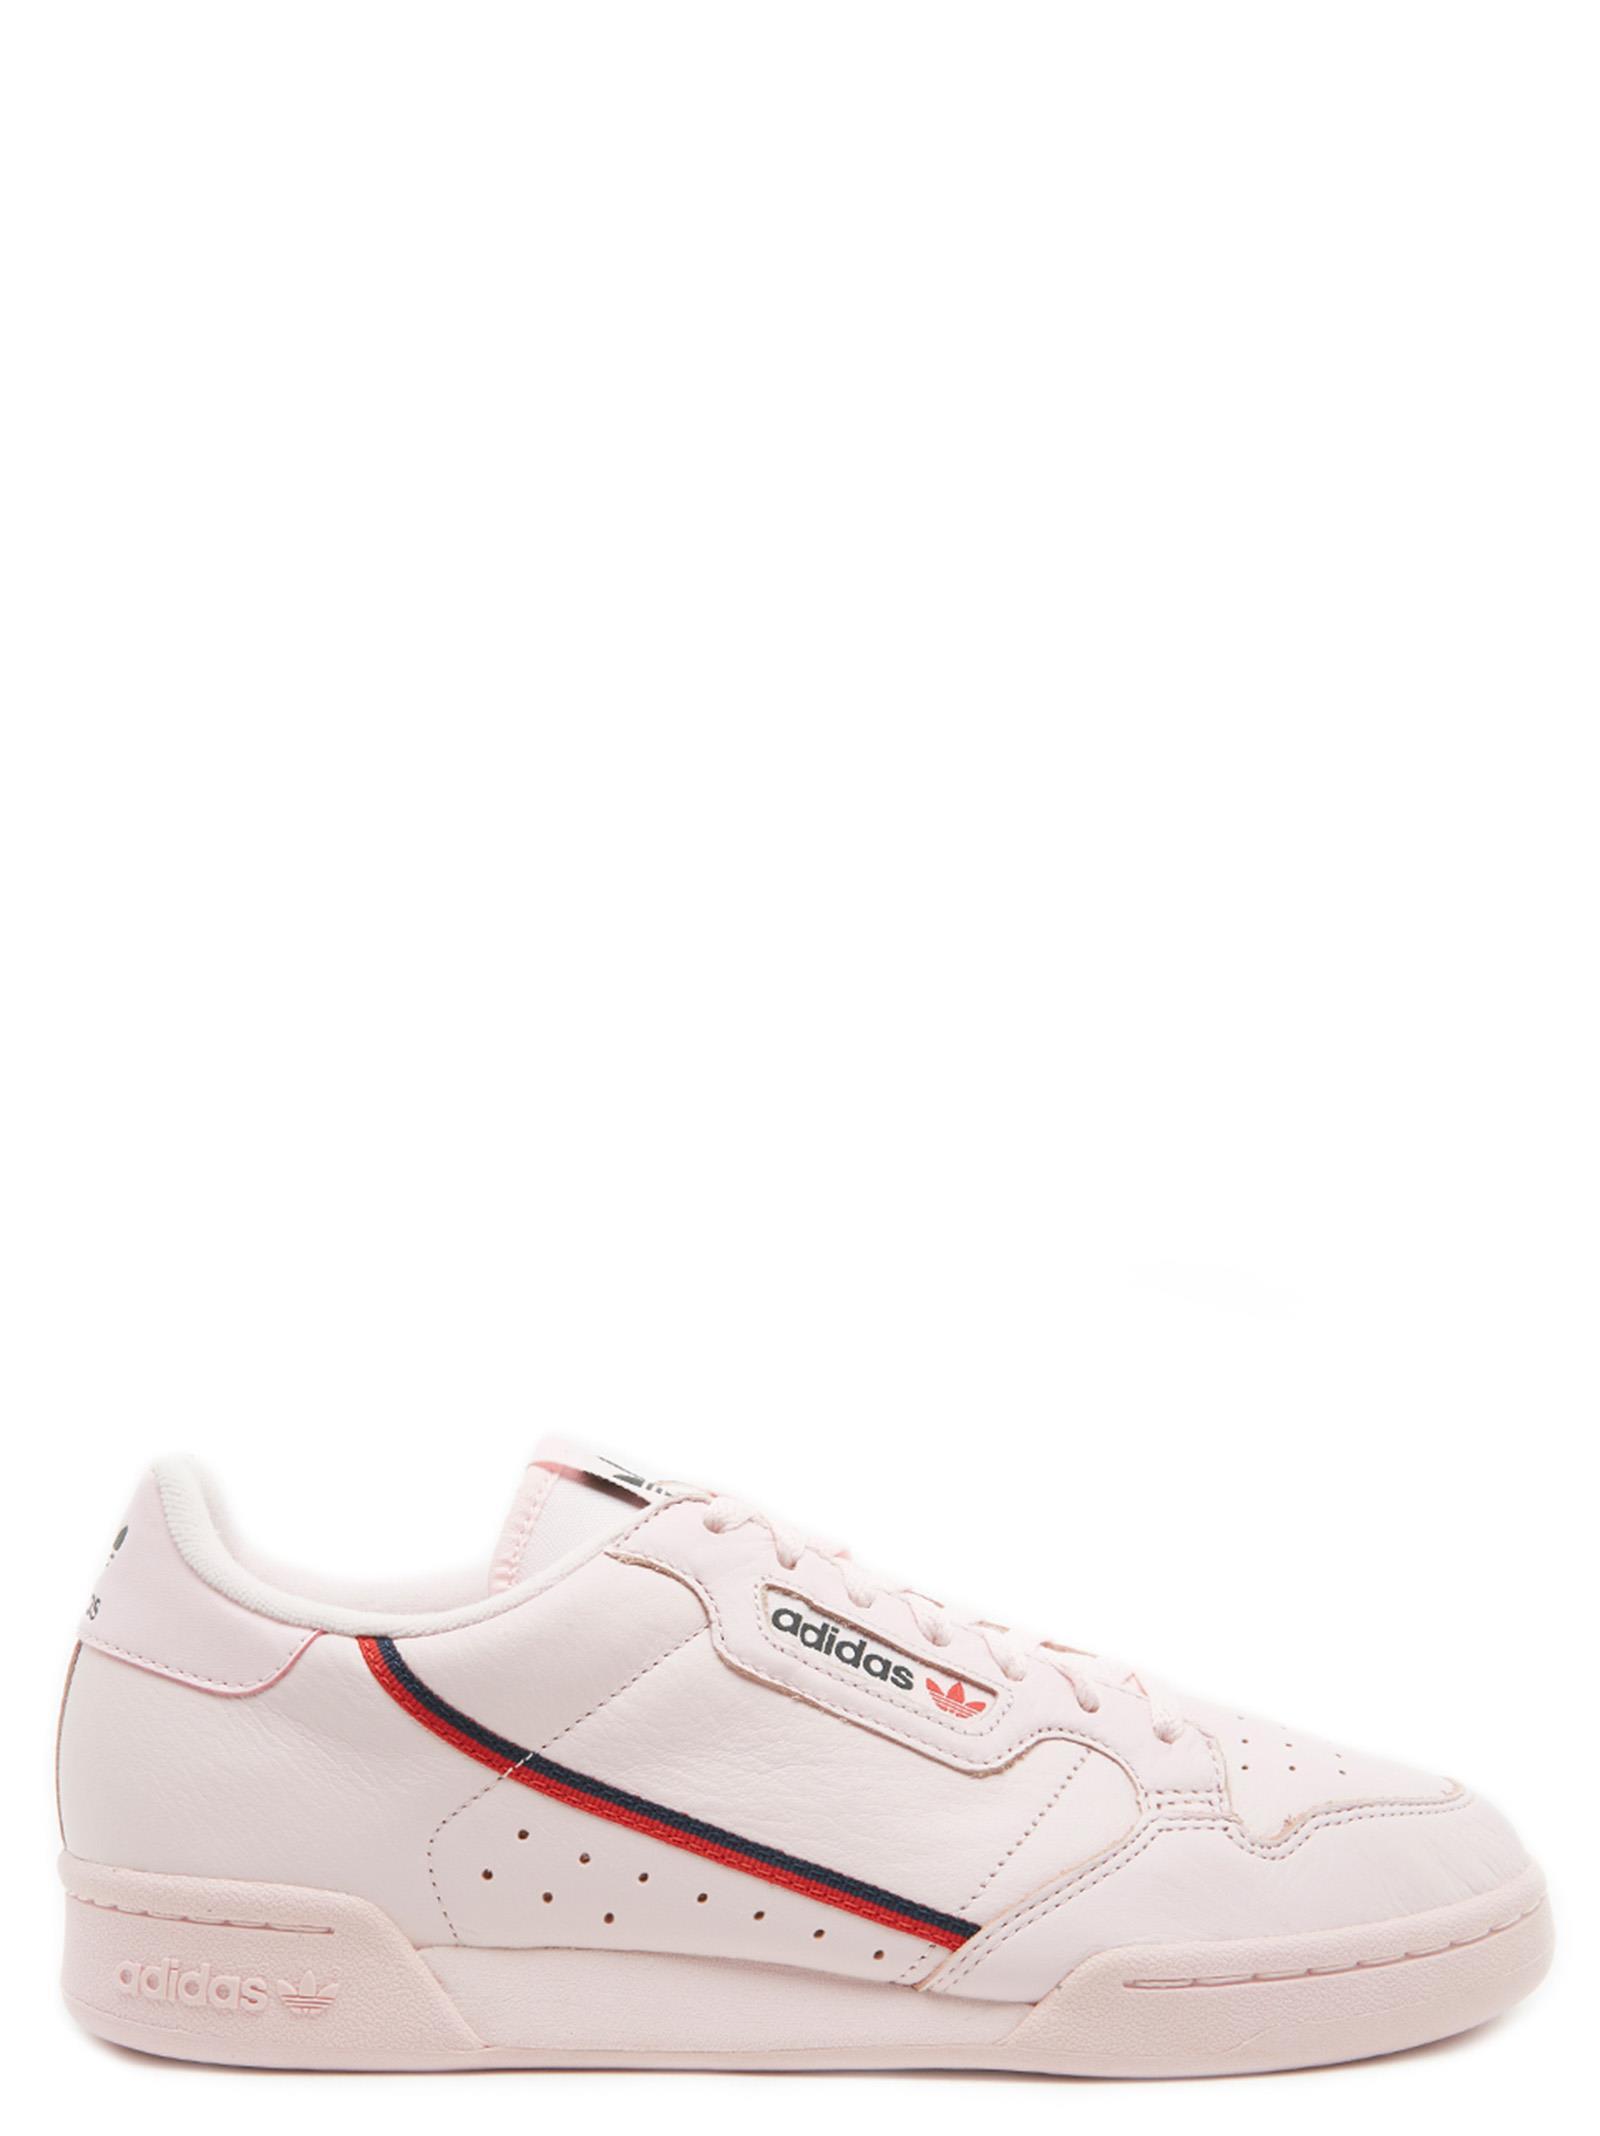 Best price on the market at italist | Adidas Originals Adidas Originals 'continental 80' Shoes